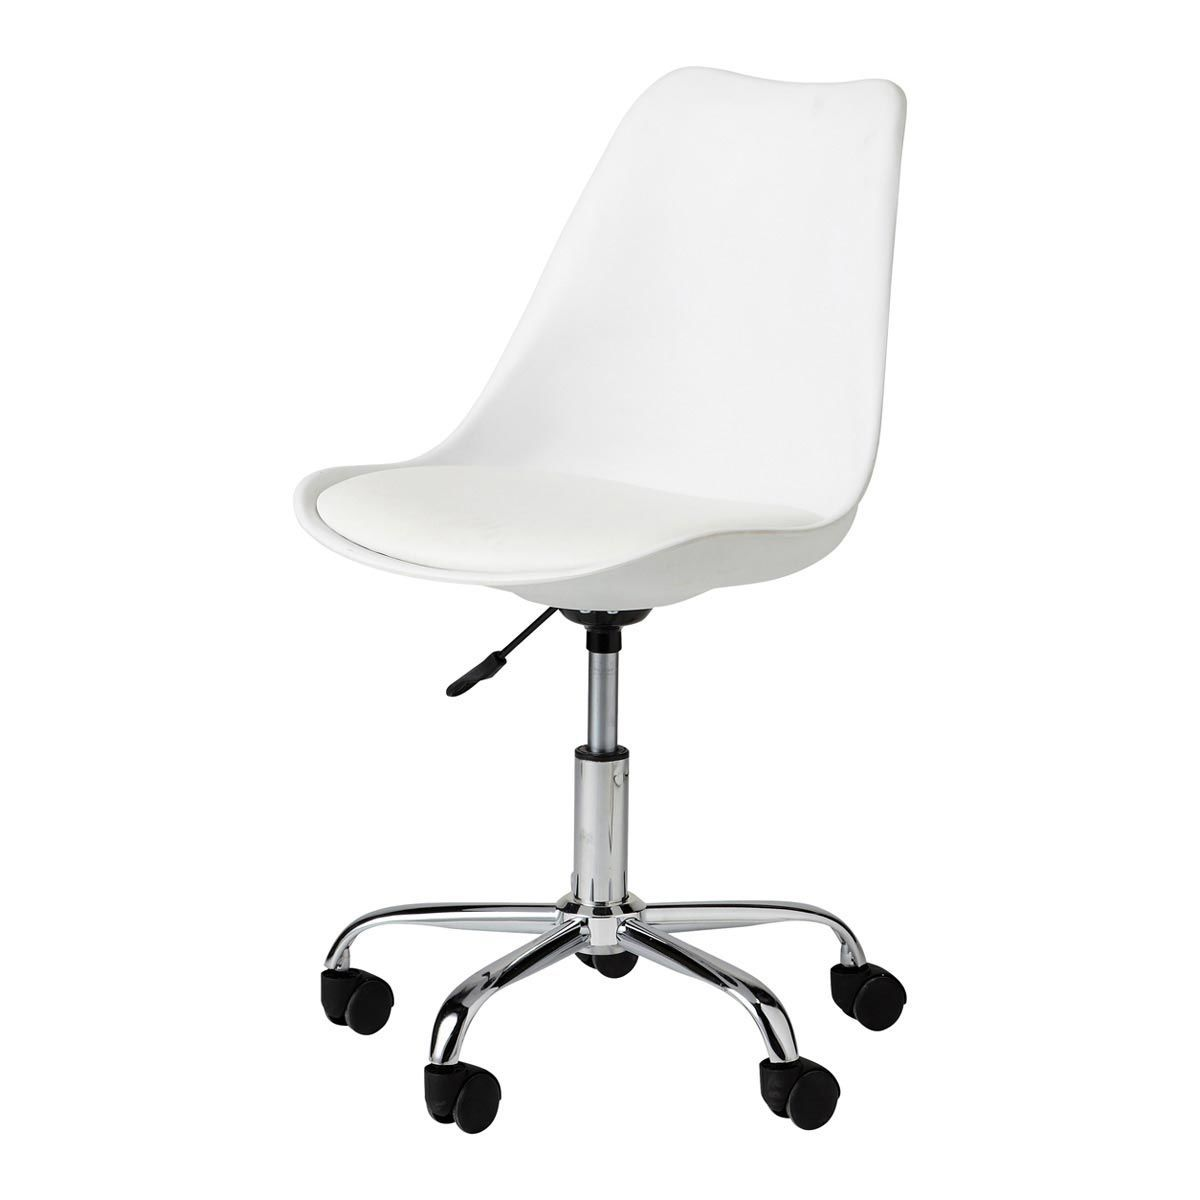 White Desk Chair With Casters Maisons Du Monde Chaise De Bureau Blanche Chaise Bureau Bureau Blanc